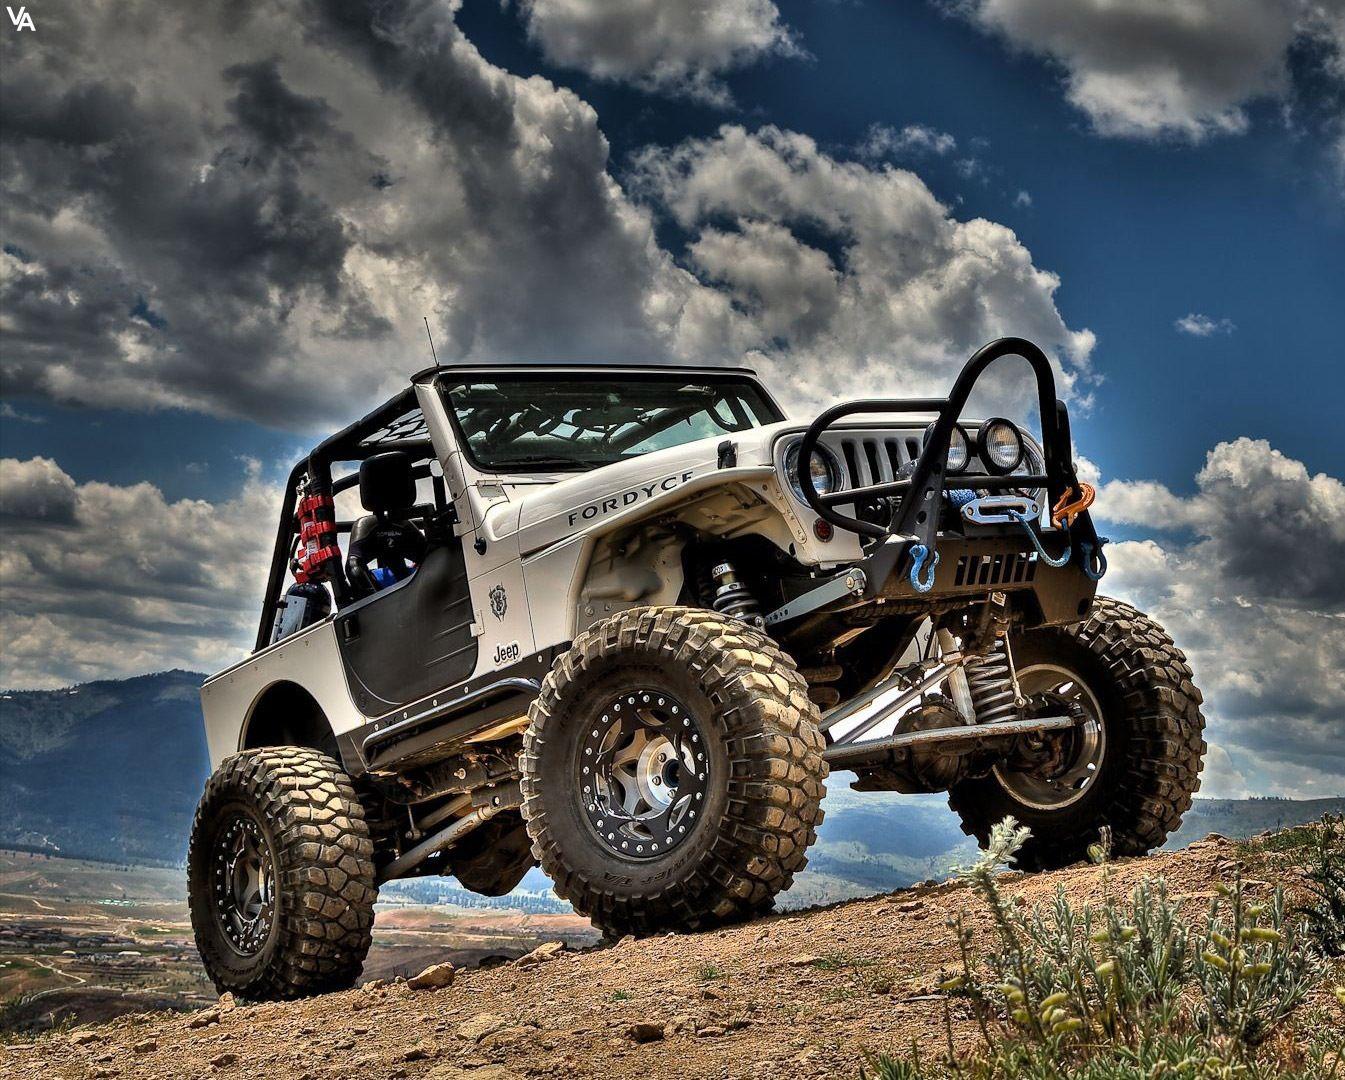 Daydreamin jeep wrangler jeep jeep wallpaper